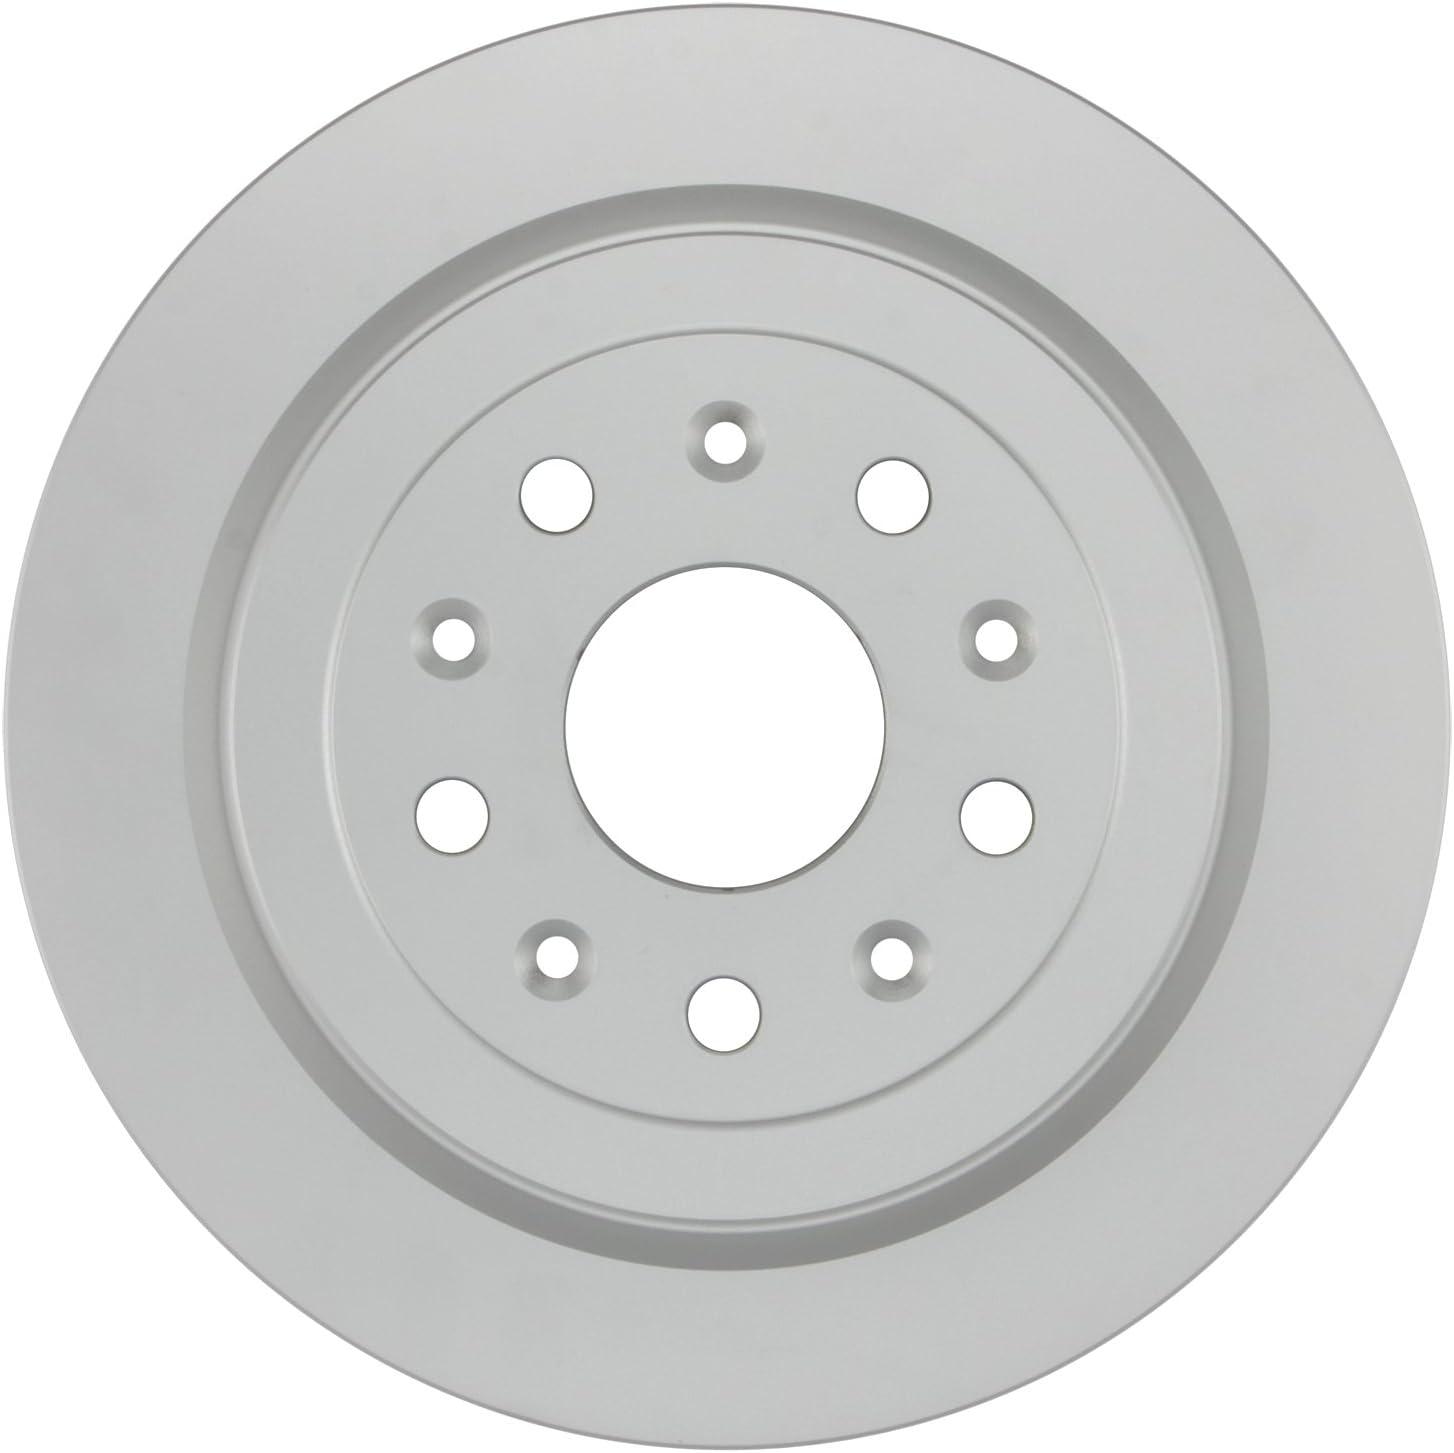 Bosch 50011658 Rear QuietCast Premium Disc Brake Rotor For 2012-2016 Toyota Prius V